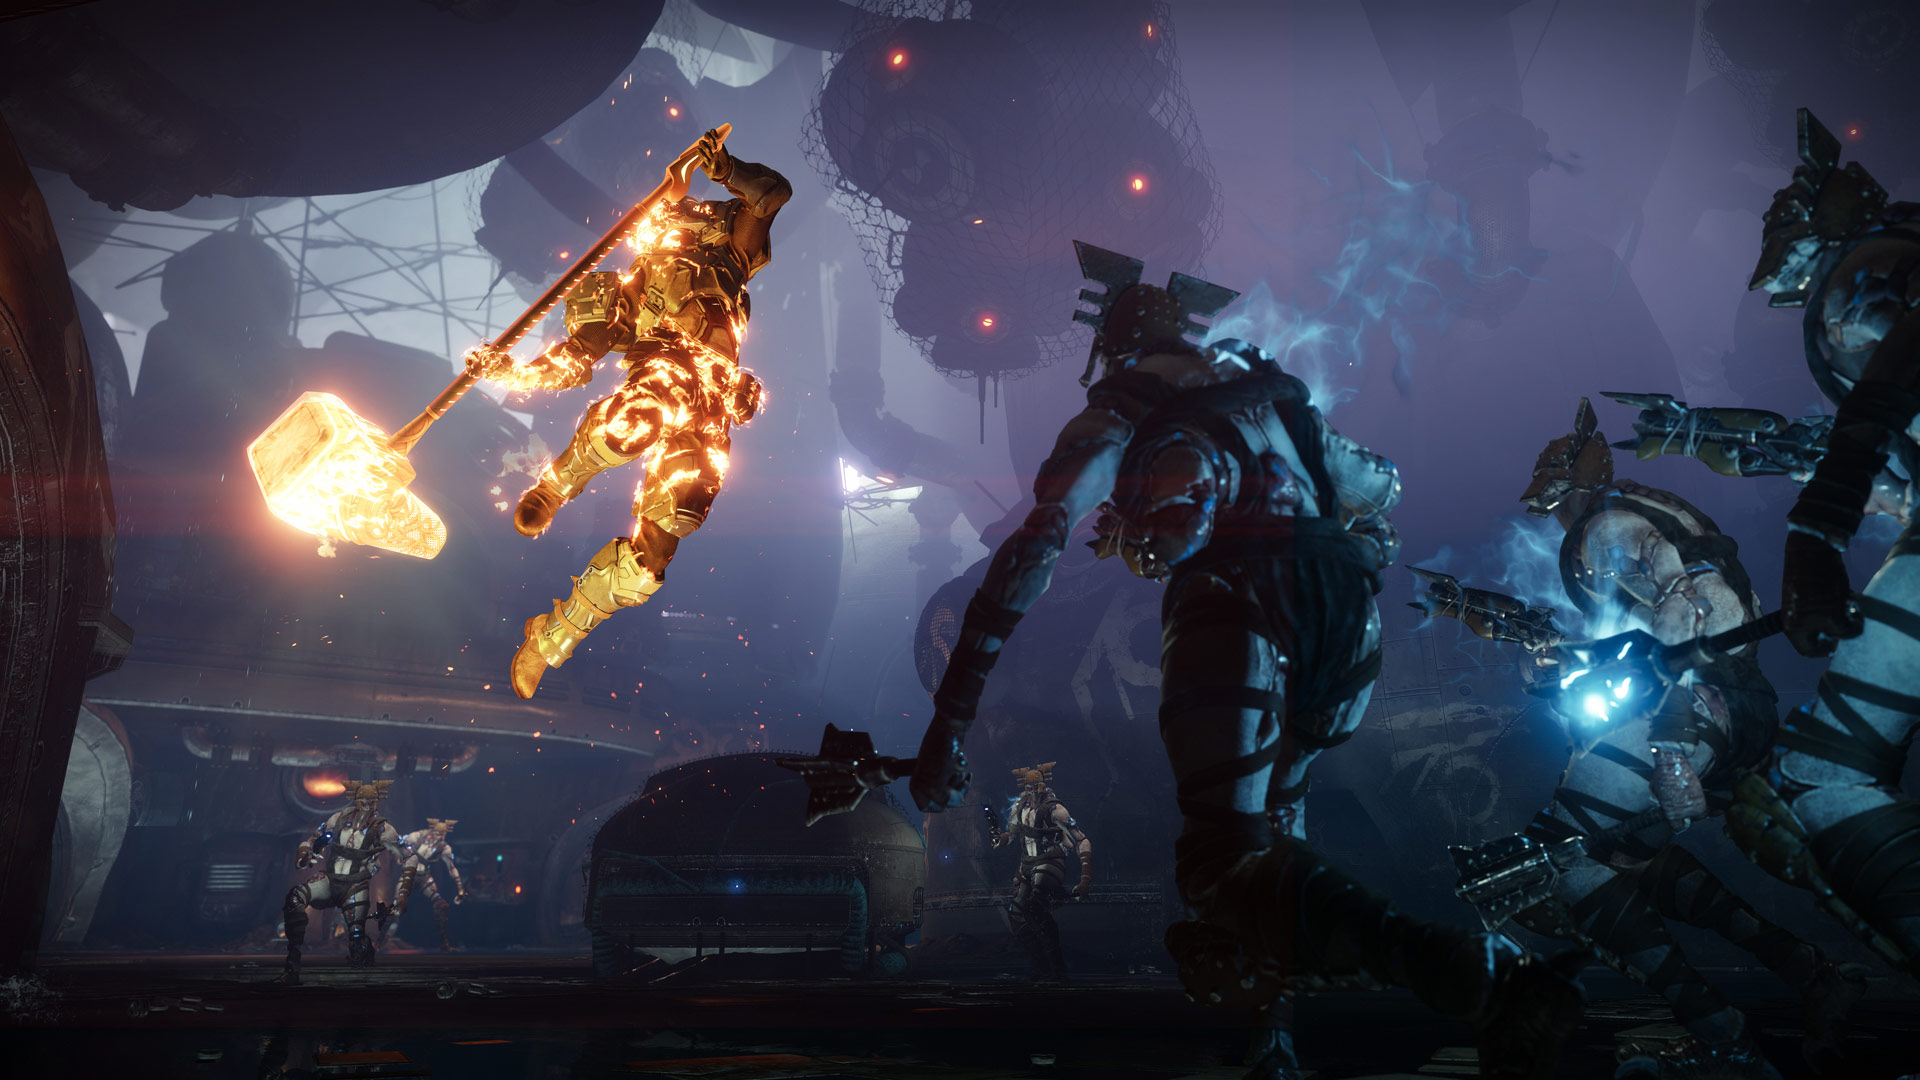 Bungie is reworking Destiny 2's Solar subclasses next season